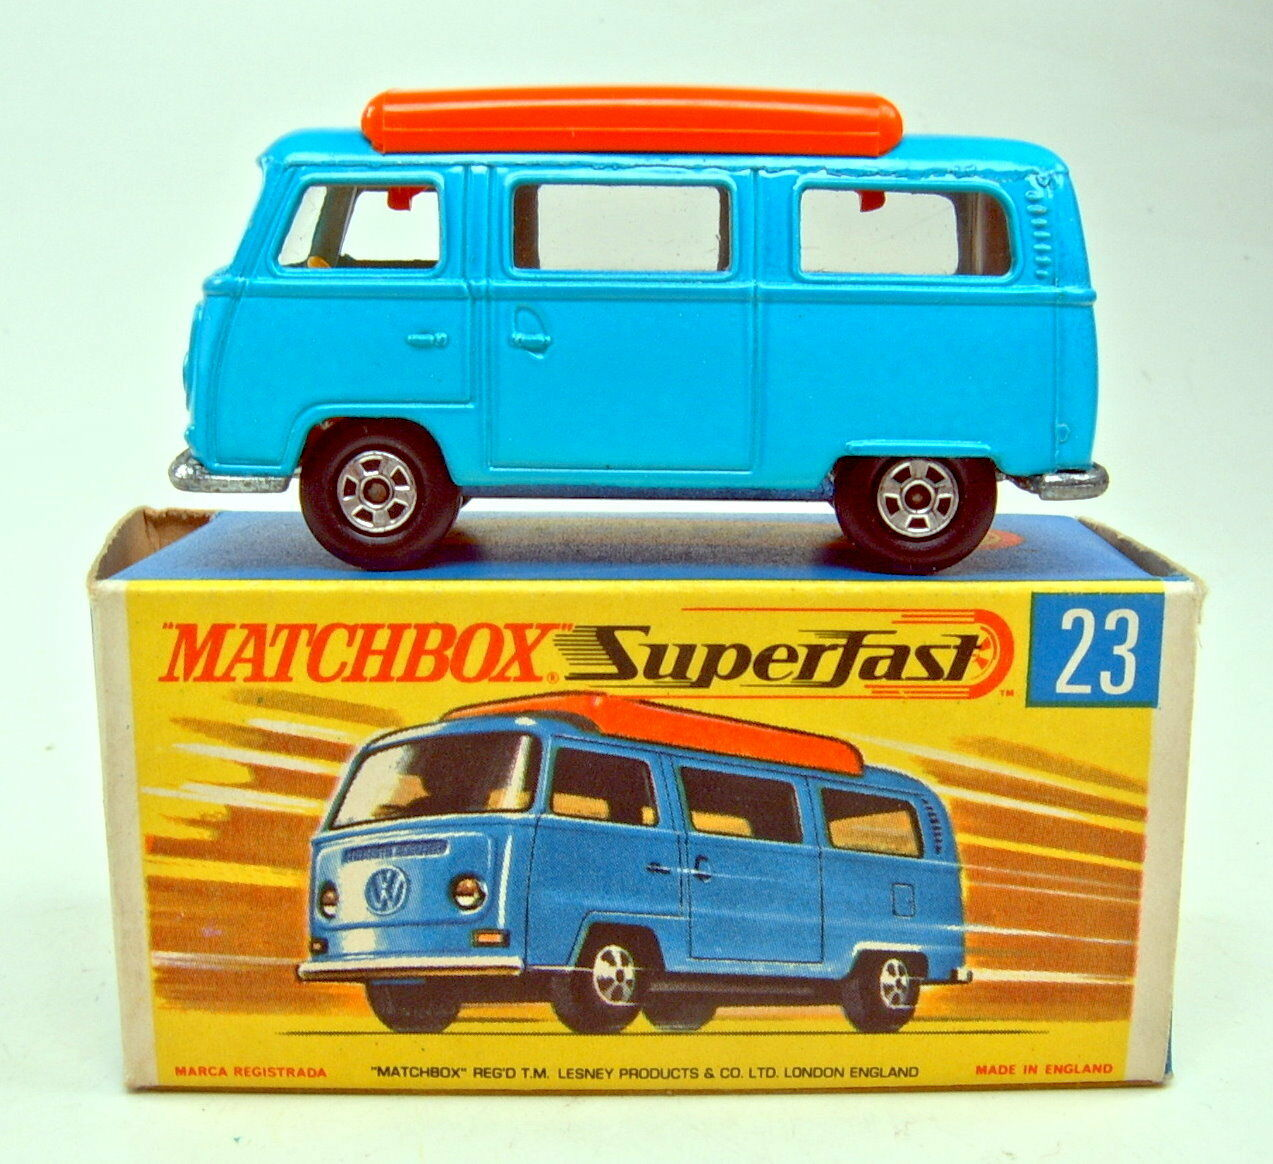 MATCHBOX SF Nº 23 a VW Camper Bleu Orange Création Top Dans Box